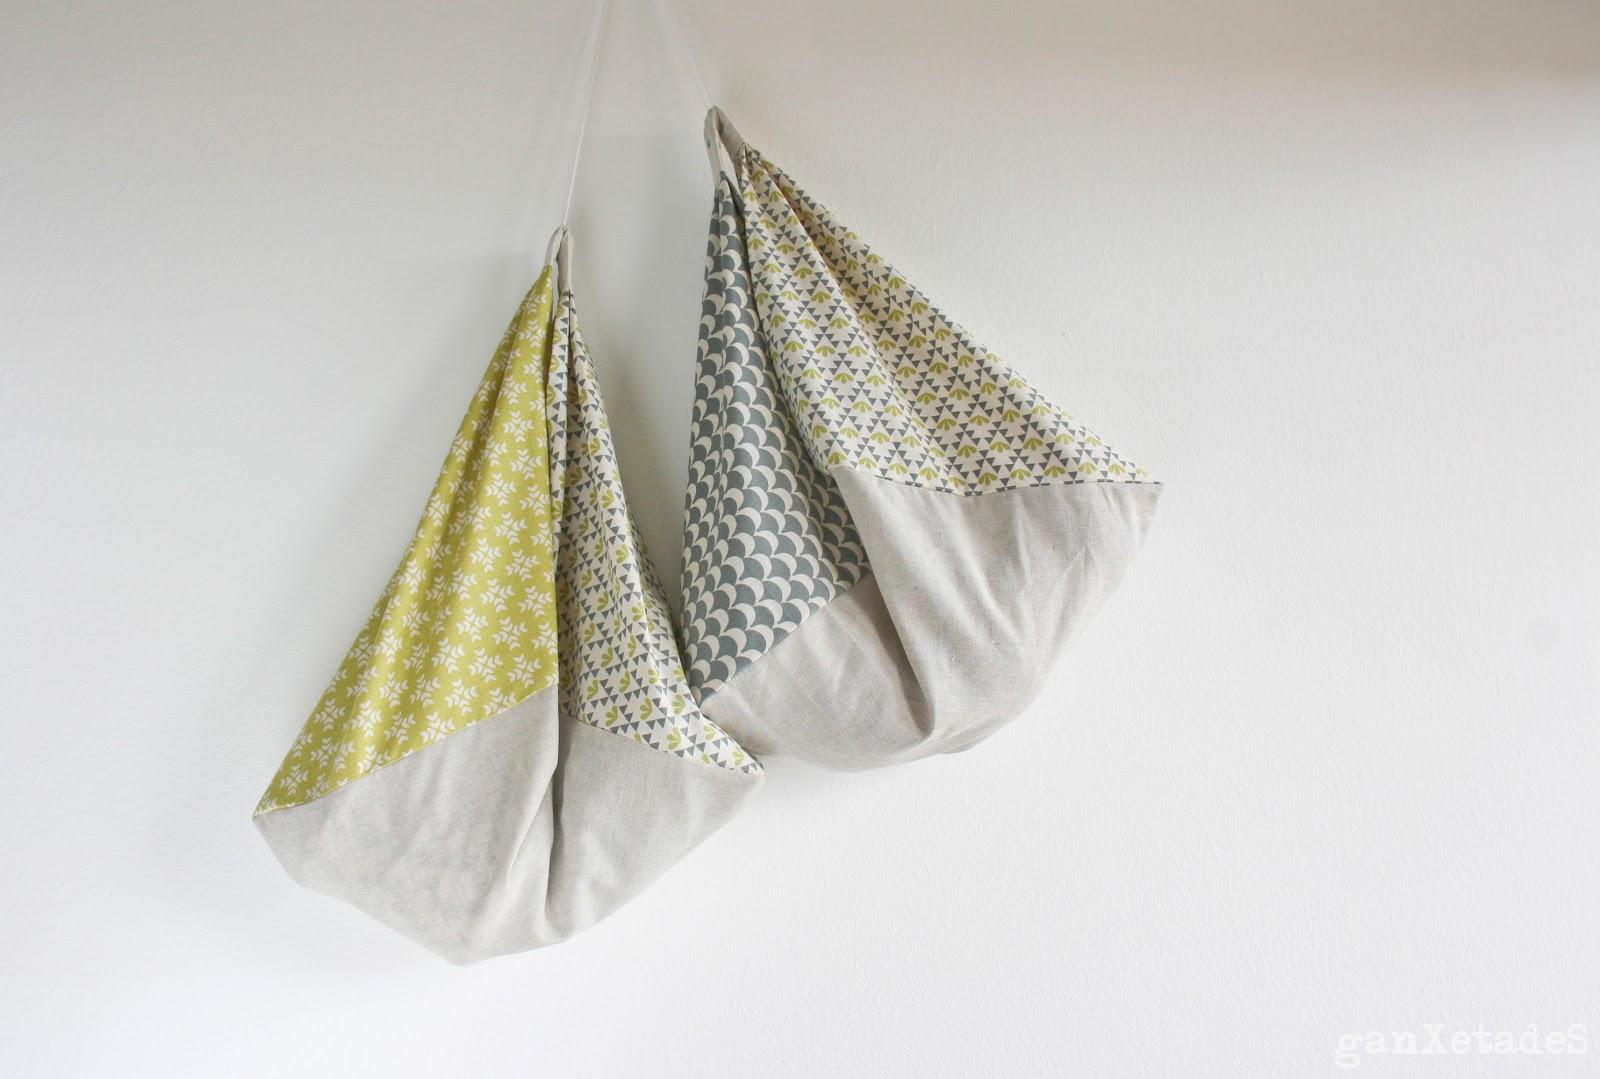 ganxetades origami bag o copiant a lua